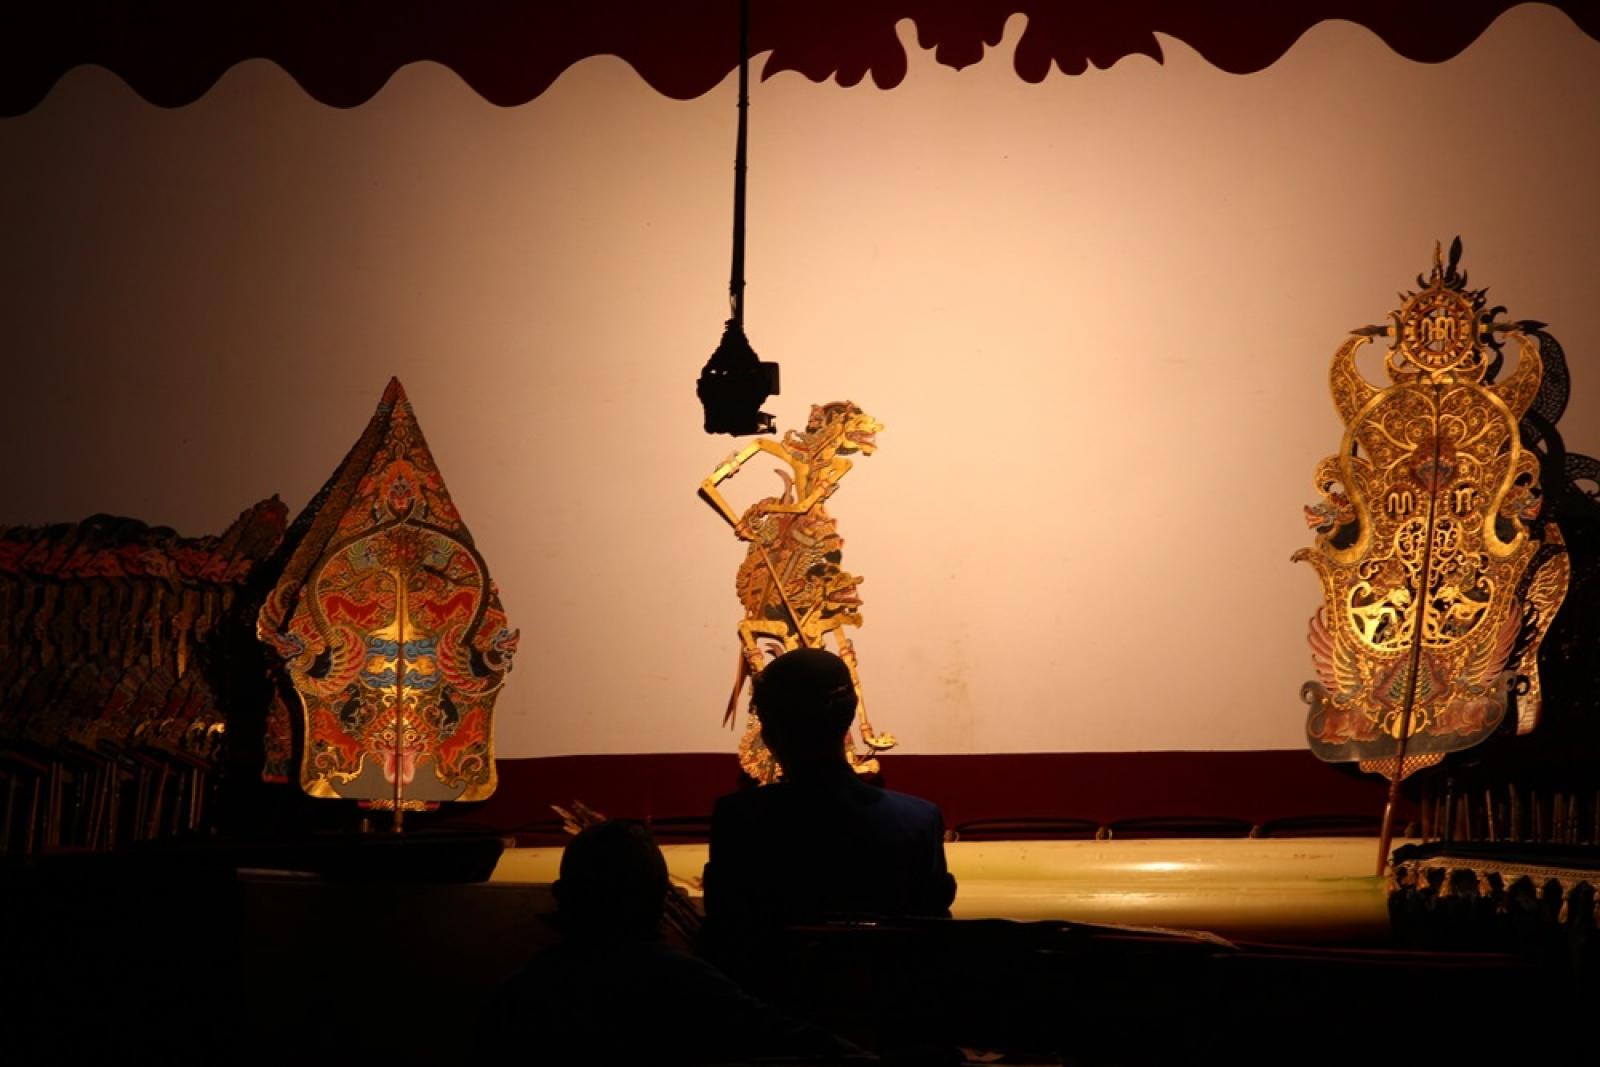 Sosialisasi Hasil Pembangunan Melalui Pagelaran Wayang Kulit Taman Budaya Seni